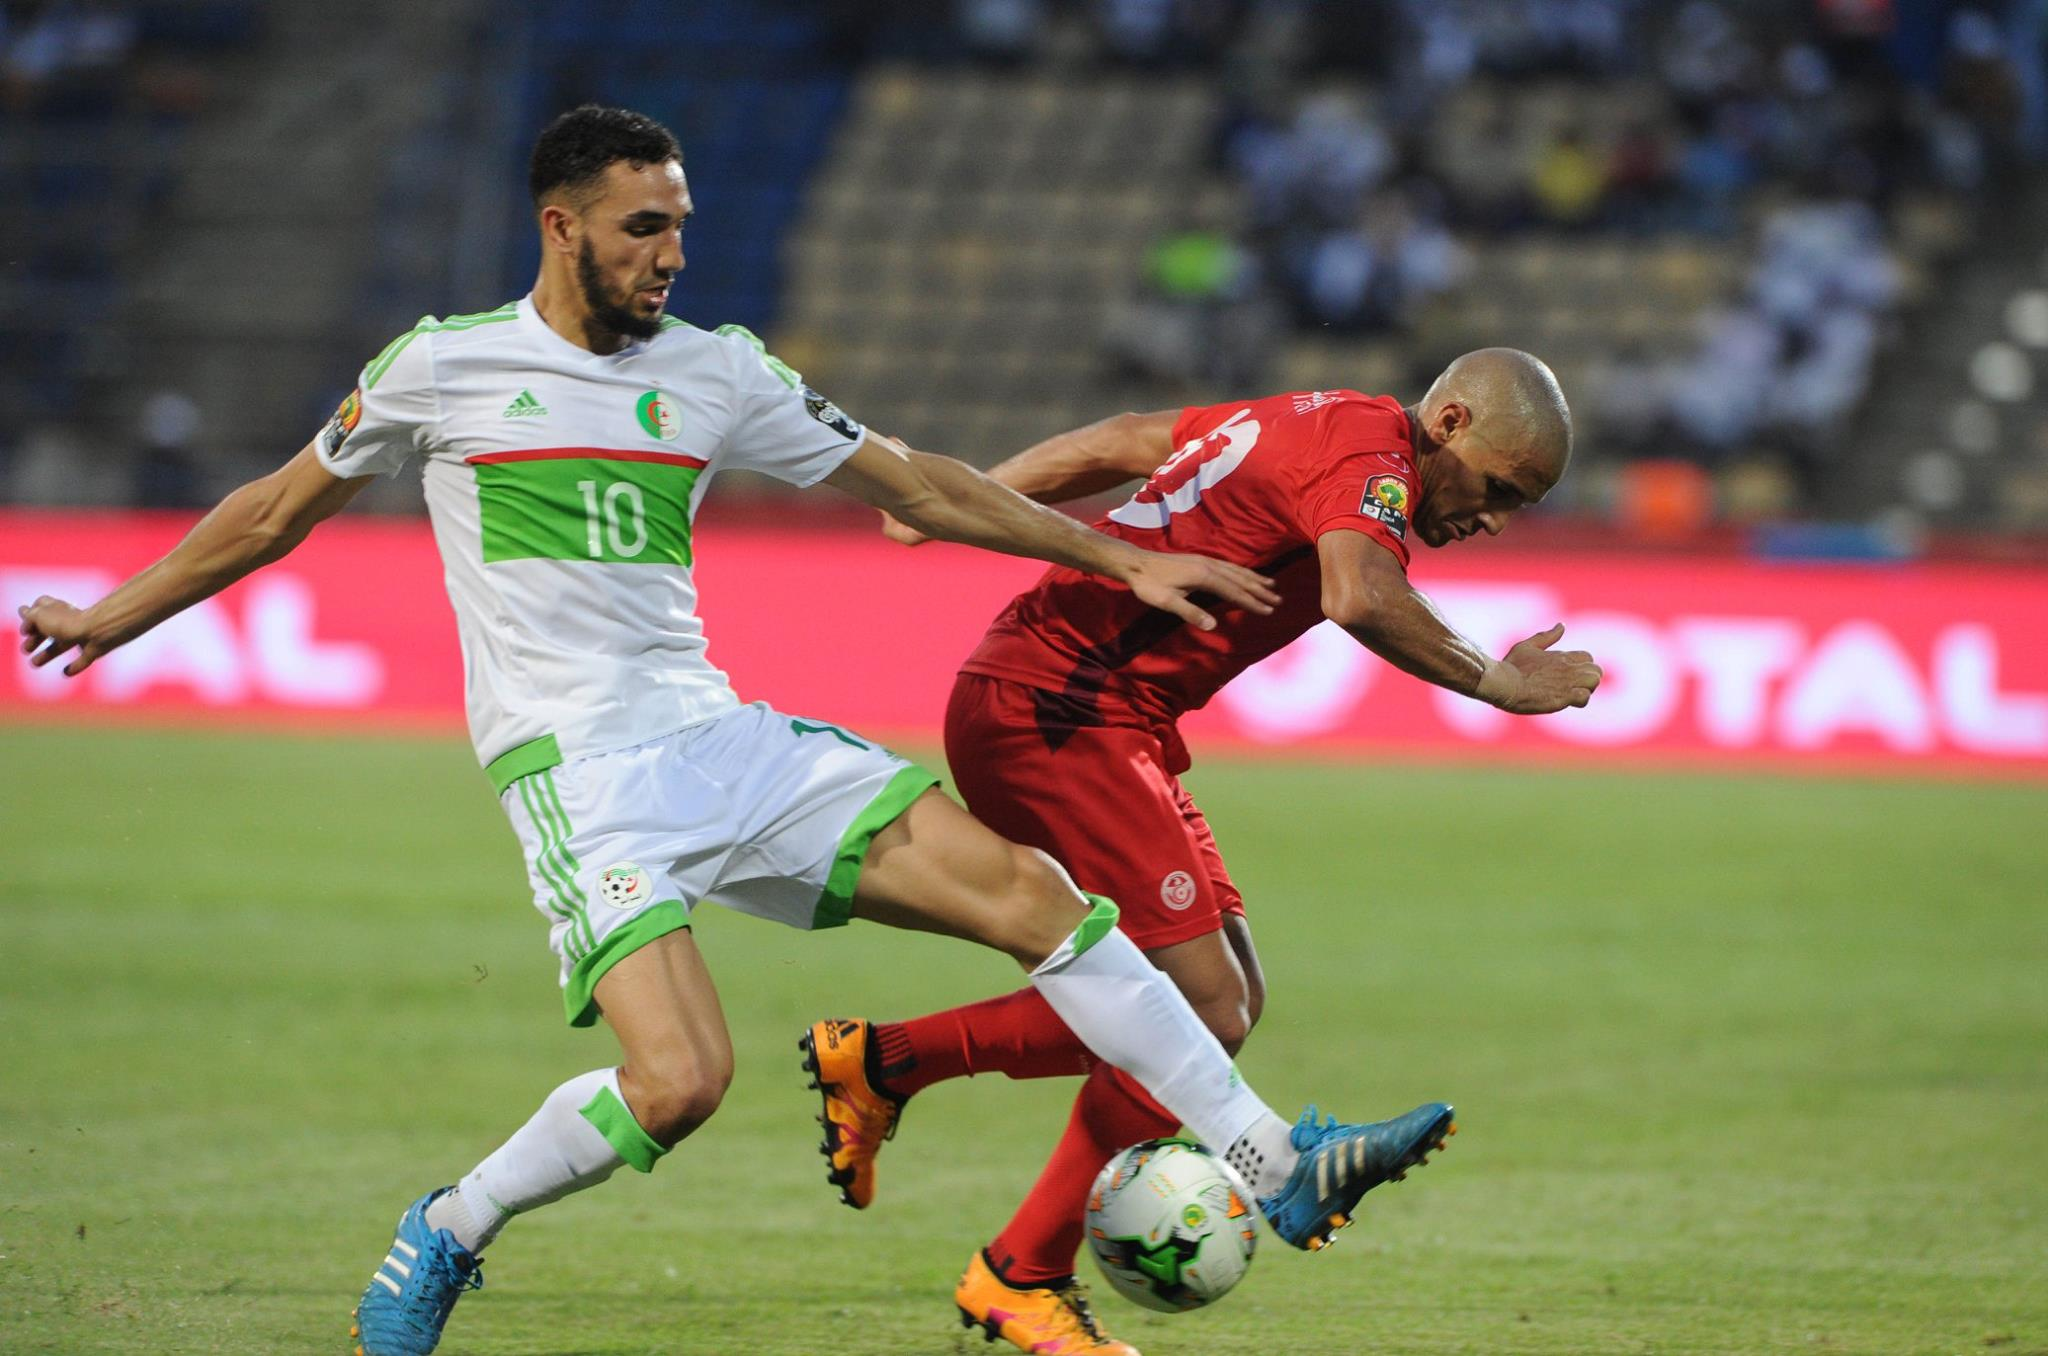 Bentaleb mediocre contre Tunisie